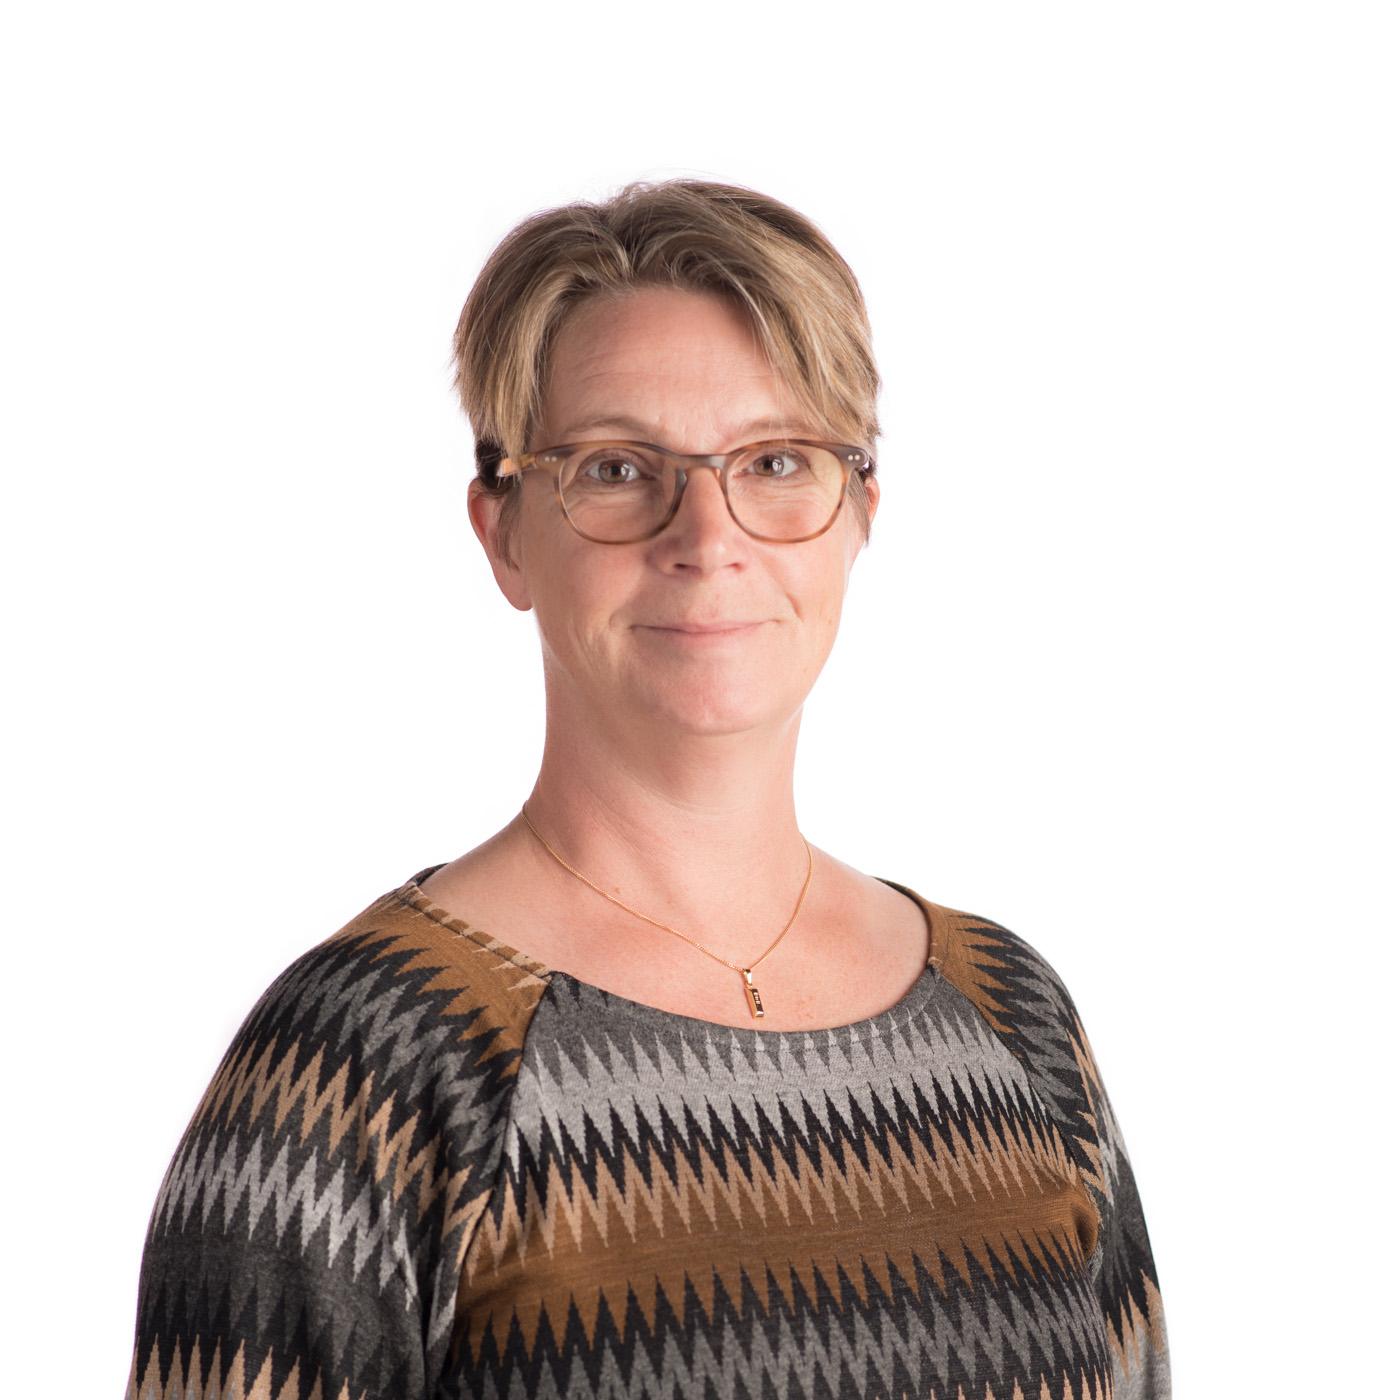 Kerstin Swensson